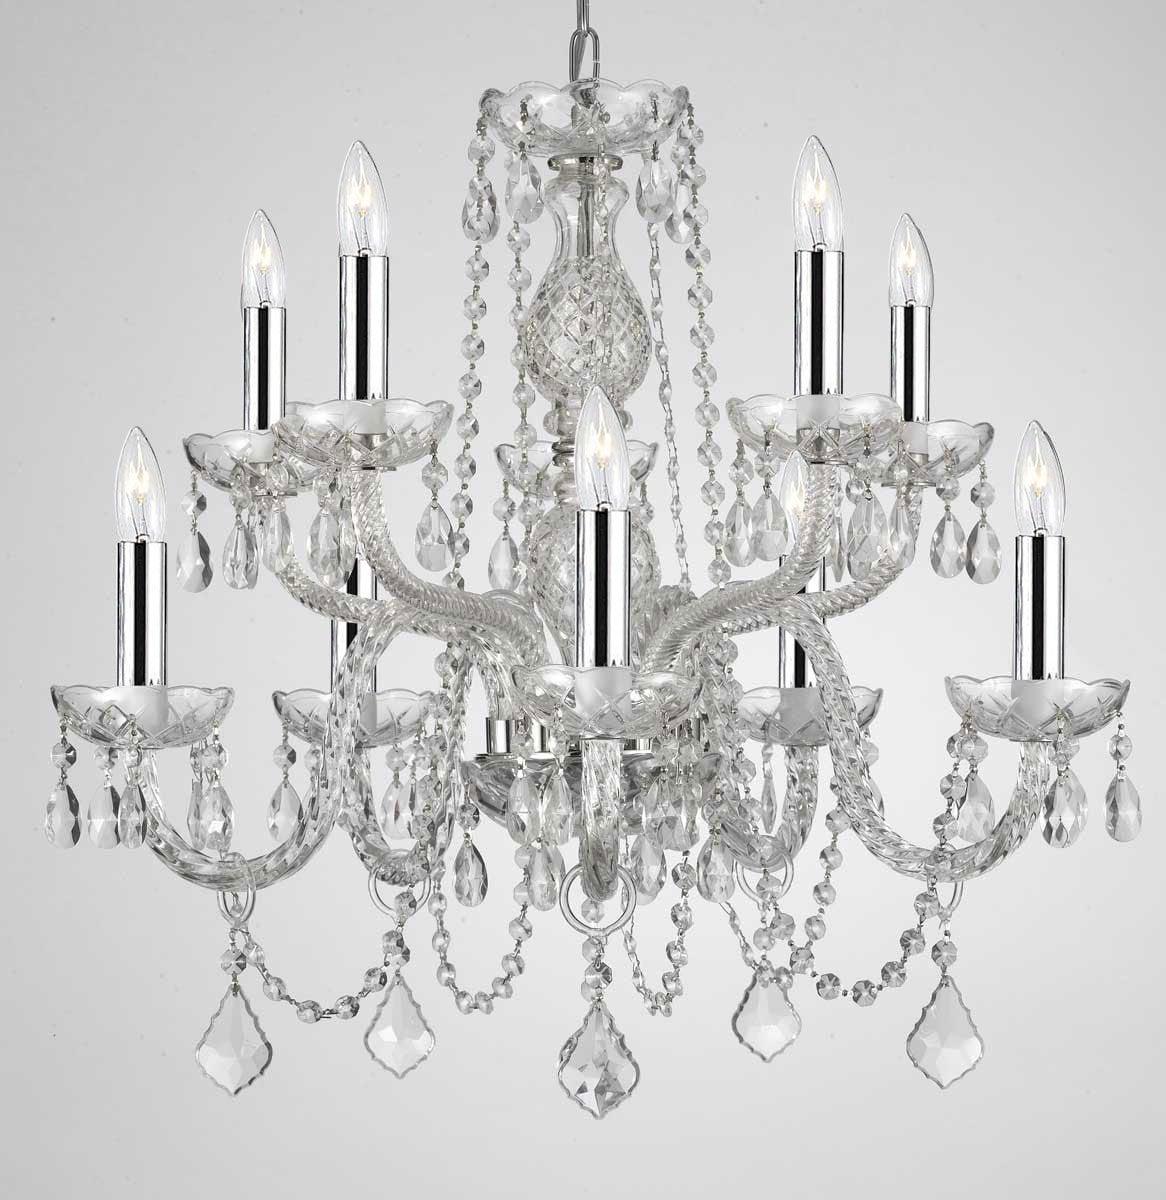 A46-CS/1122/5+5 / LED Compatible / Indoor / 10 Lights Chandeliers 0